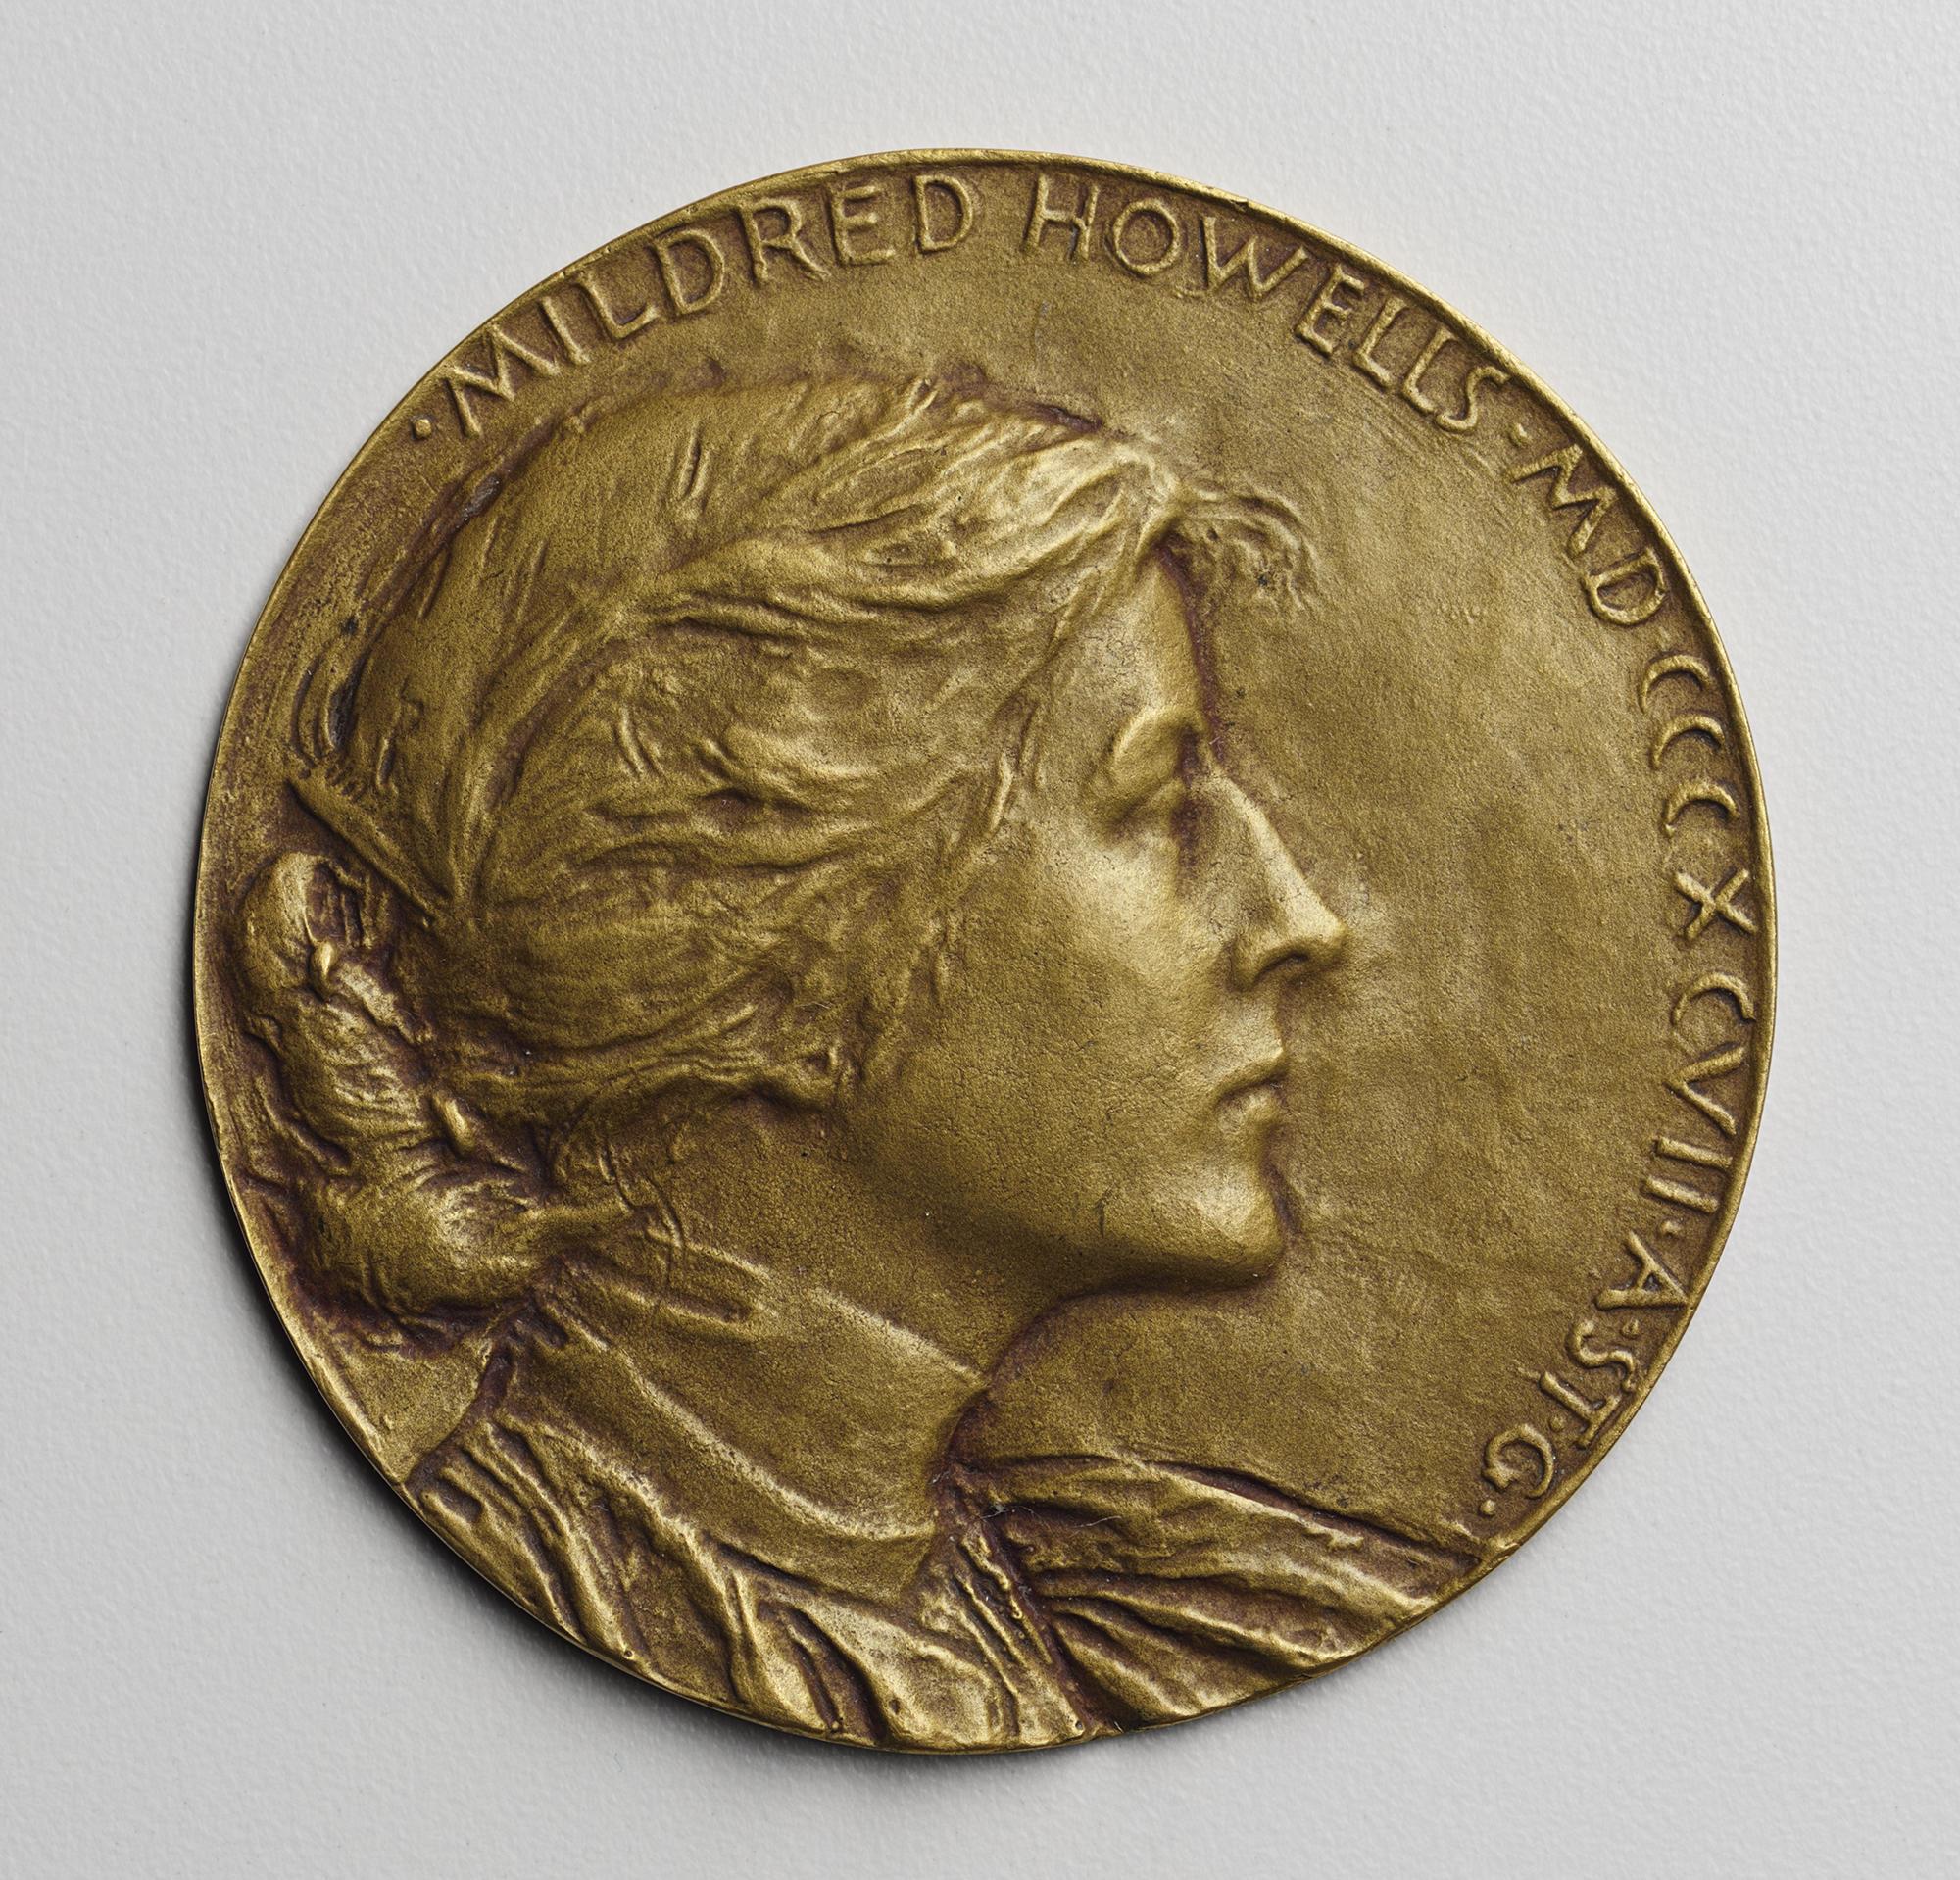 Augustus Saint-Gaudens (American, 1848-1907), Medallion of Mildred Howells (1873-1966), 1897